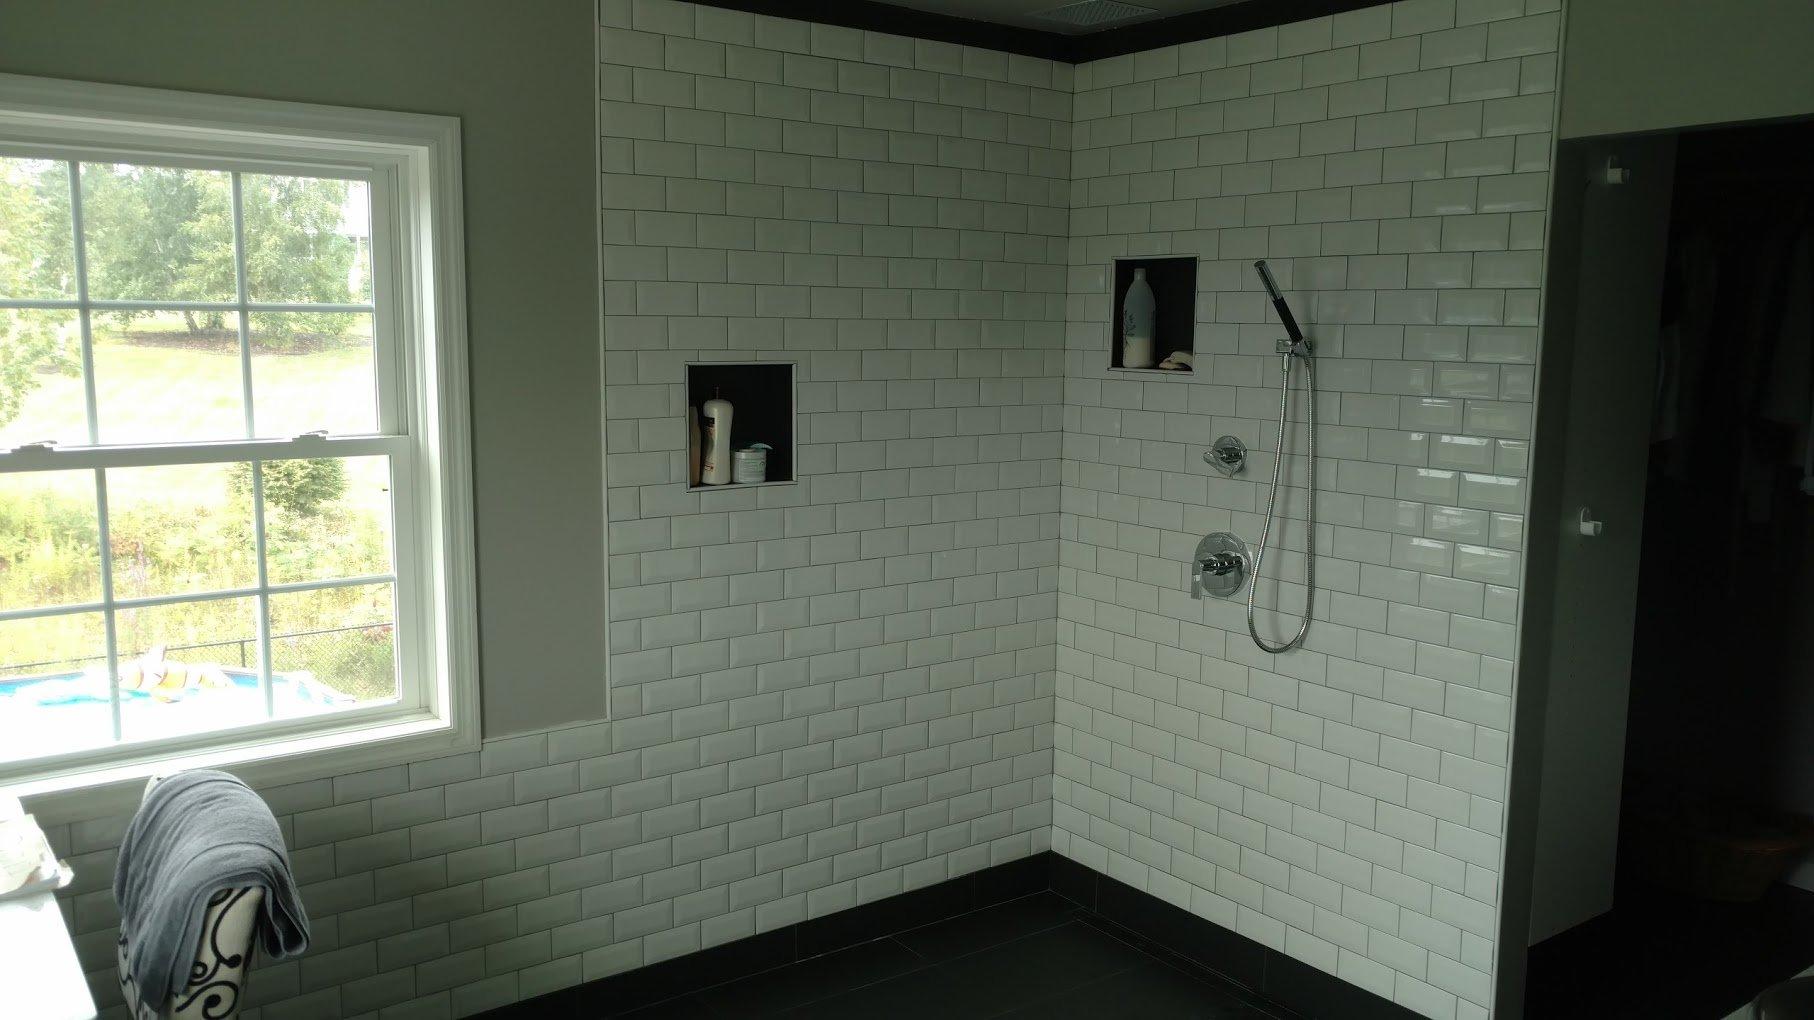 Bathroom Remodeling Bathroom Vanity Installation Marlboro - Bathroom remodel what to do first